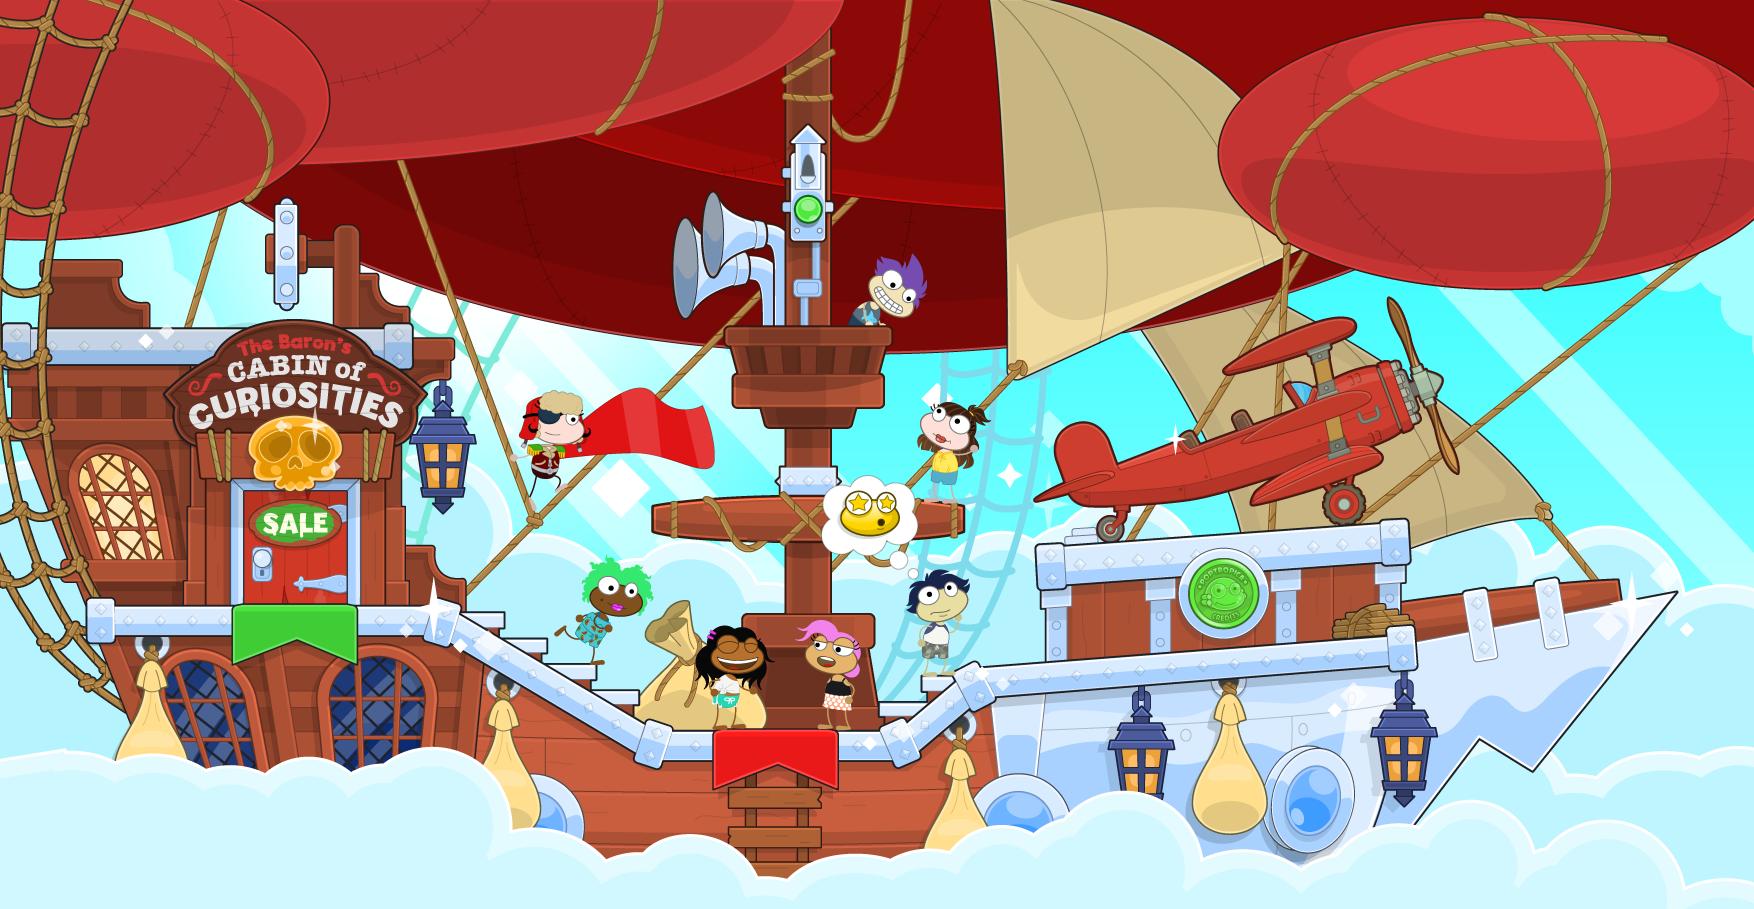 It's a bird! It's a plane! It's the Baron!